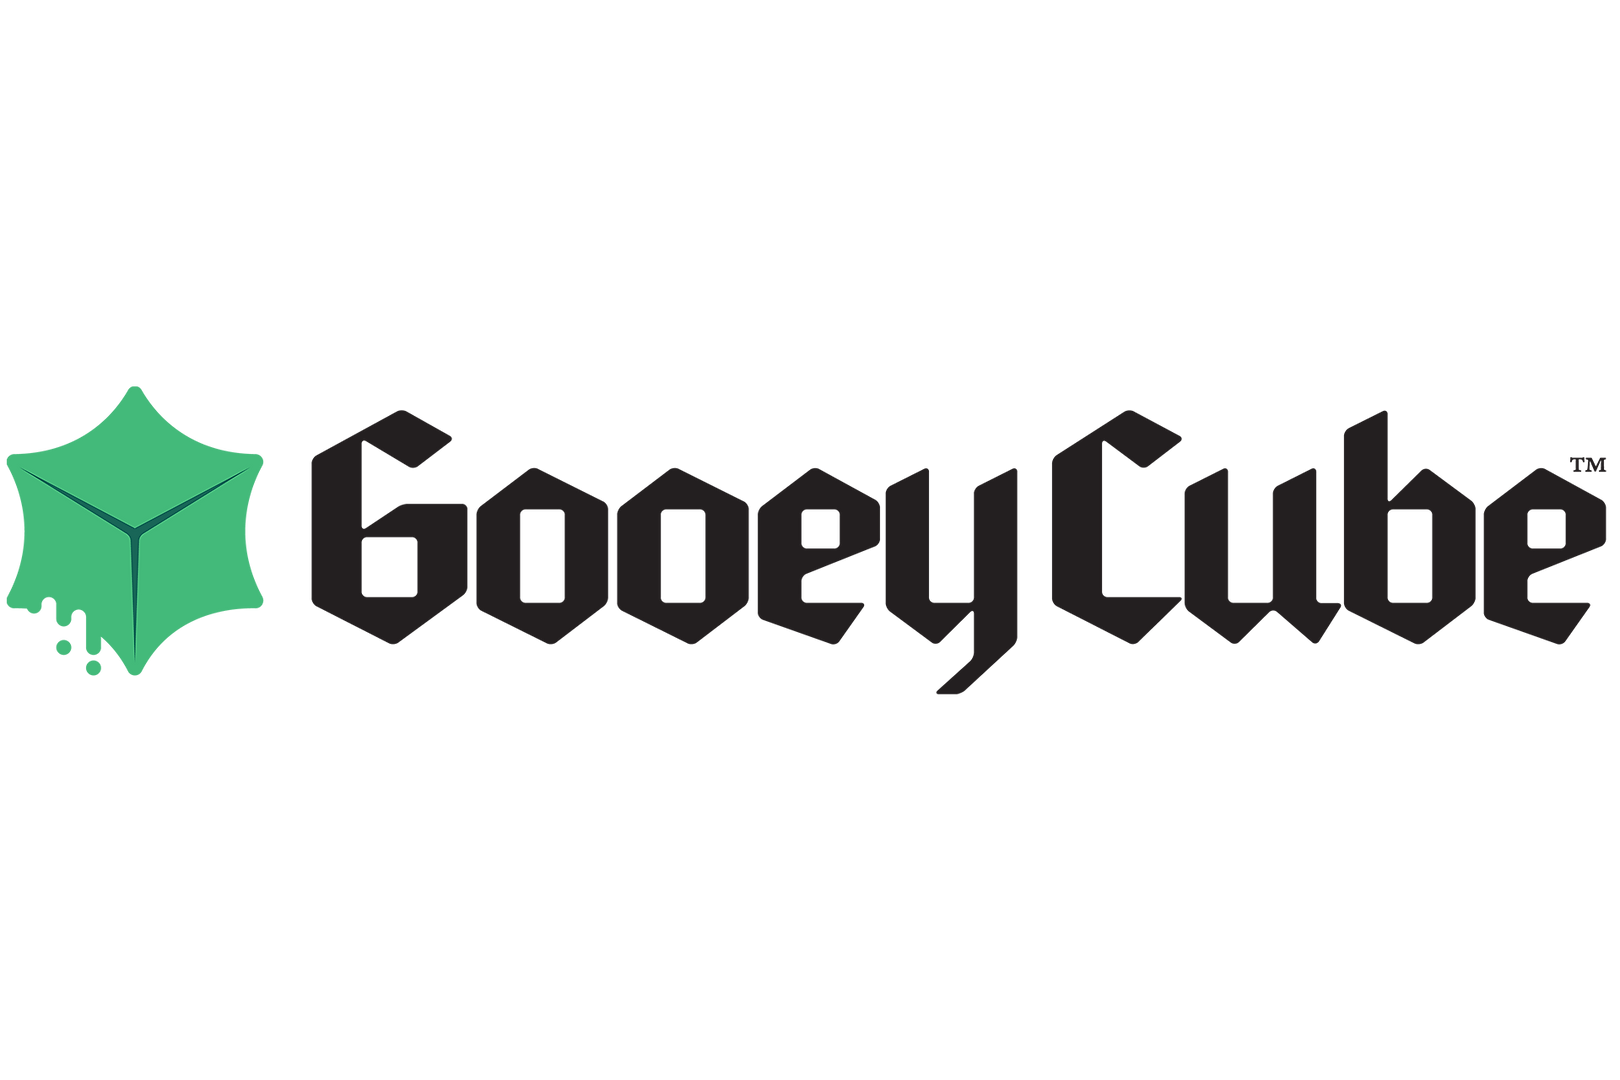 gooeylogo.png